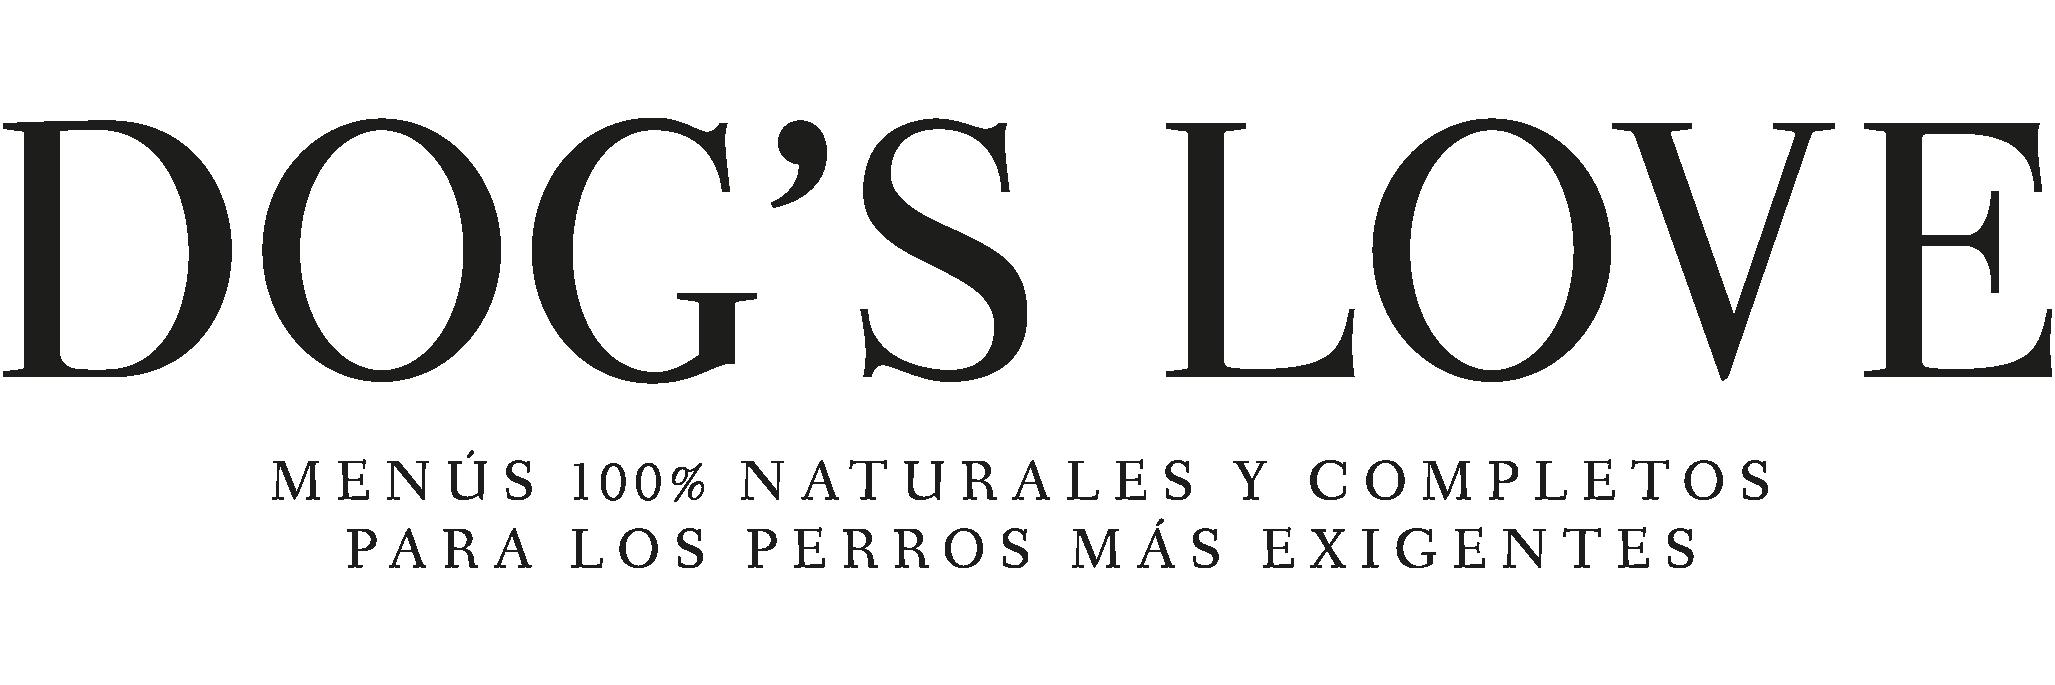 DL_Logo_ES_komp_